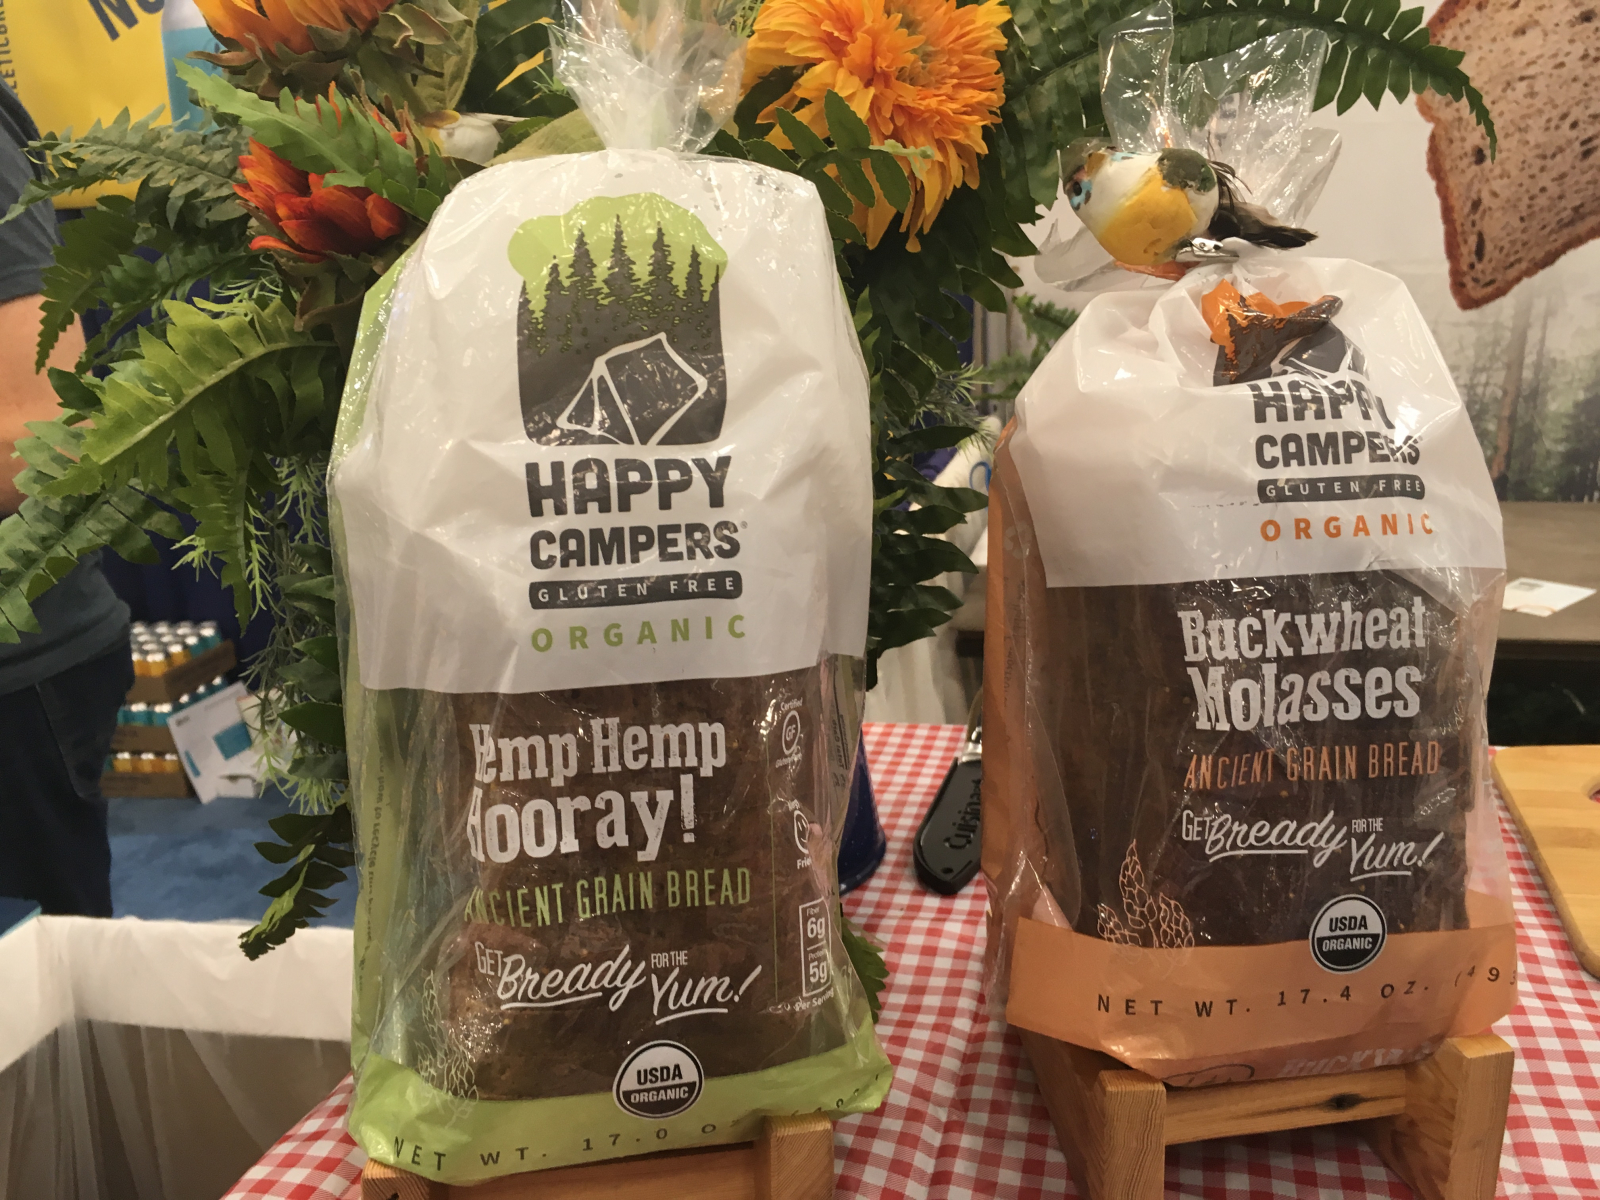 Happy Campers Gluten-Free Bread